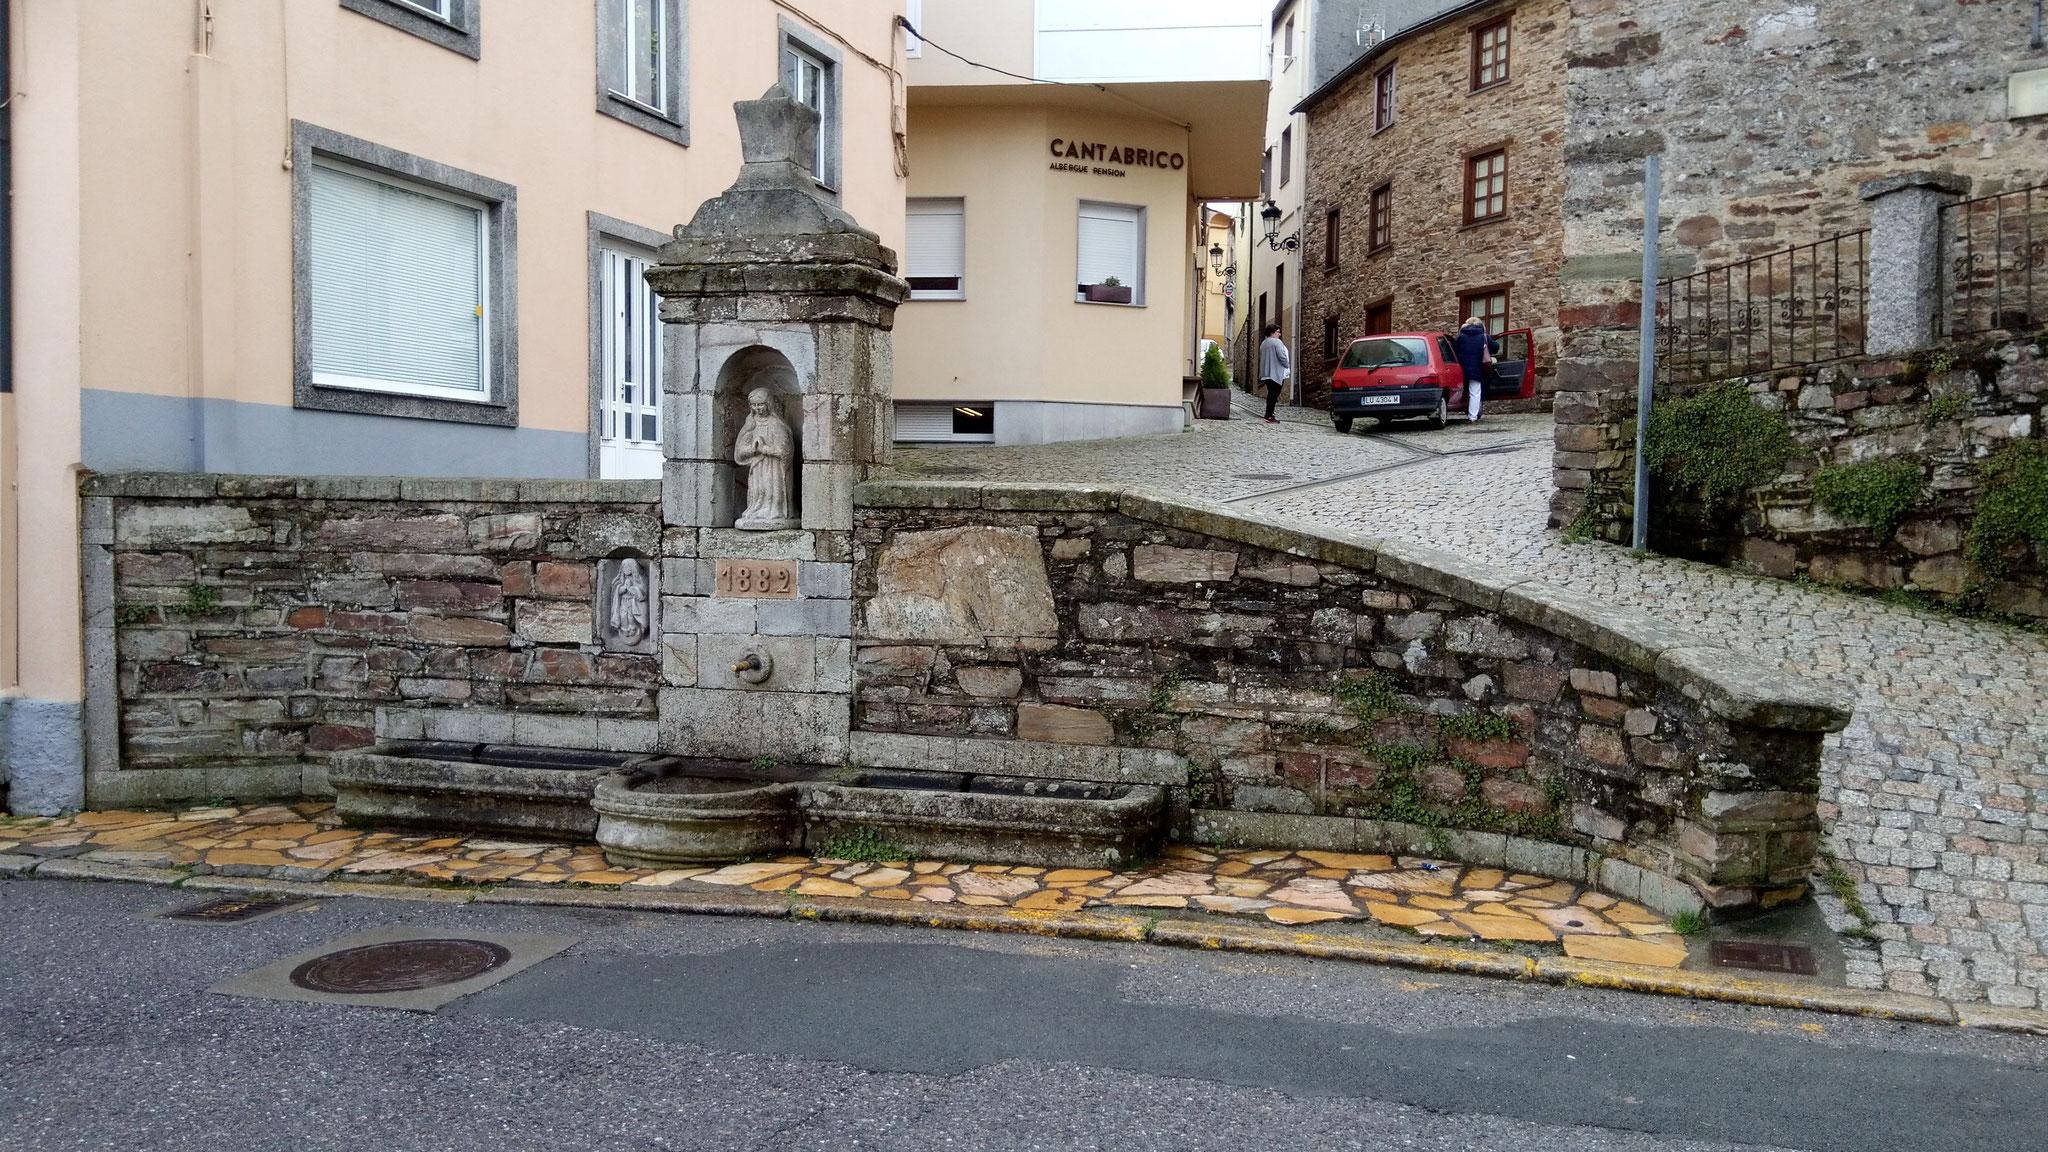 A Fonsagrada: der Namensgebende Brunnen genau vor unserer Herberge